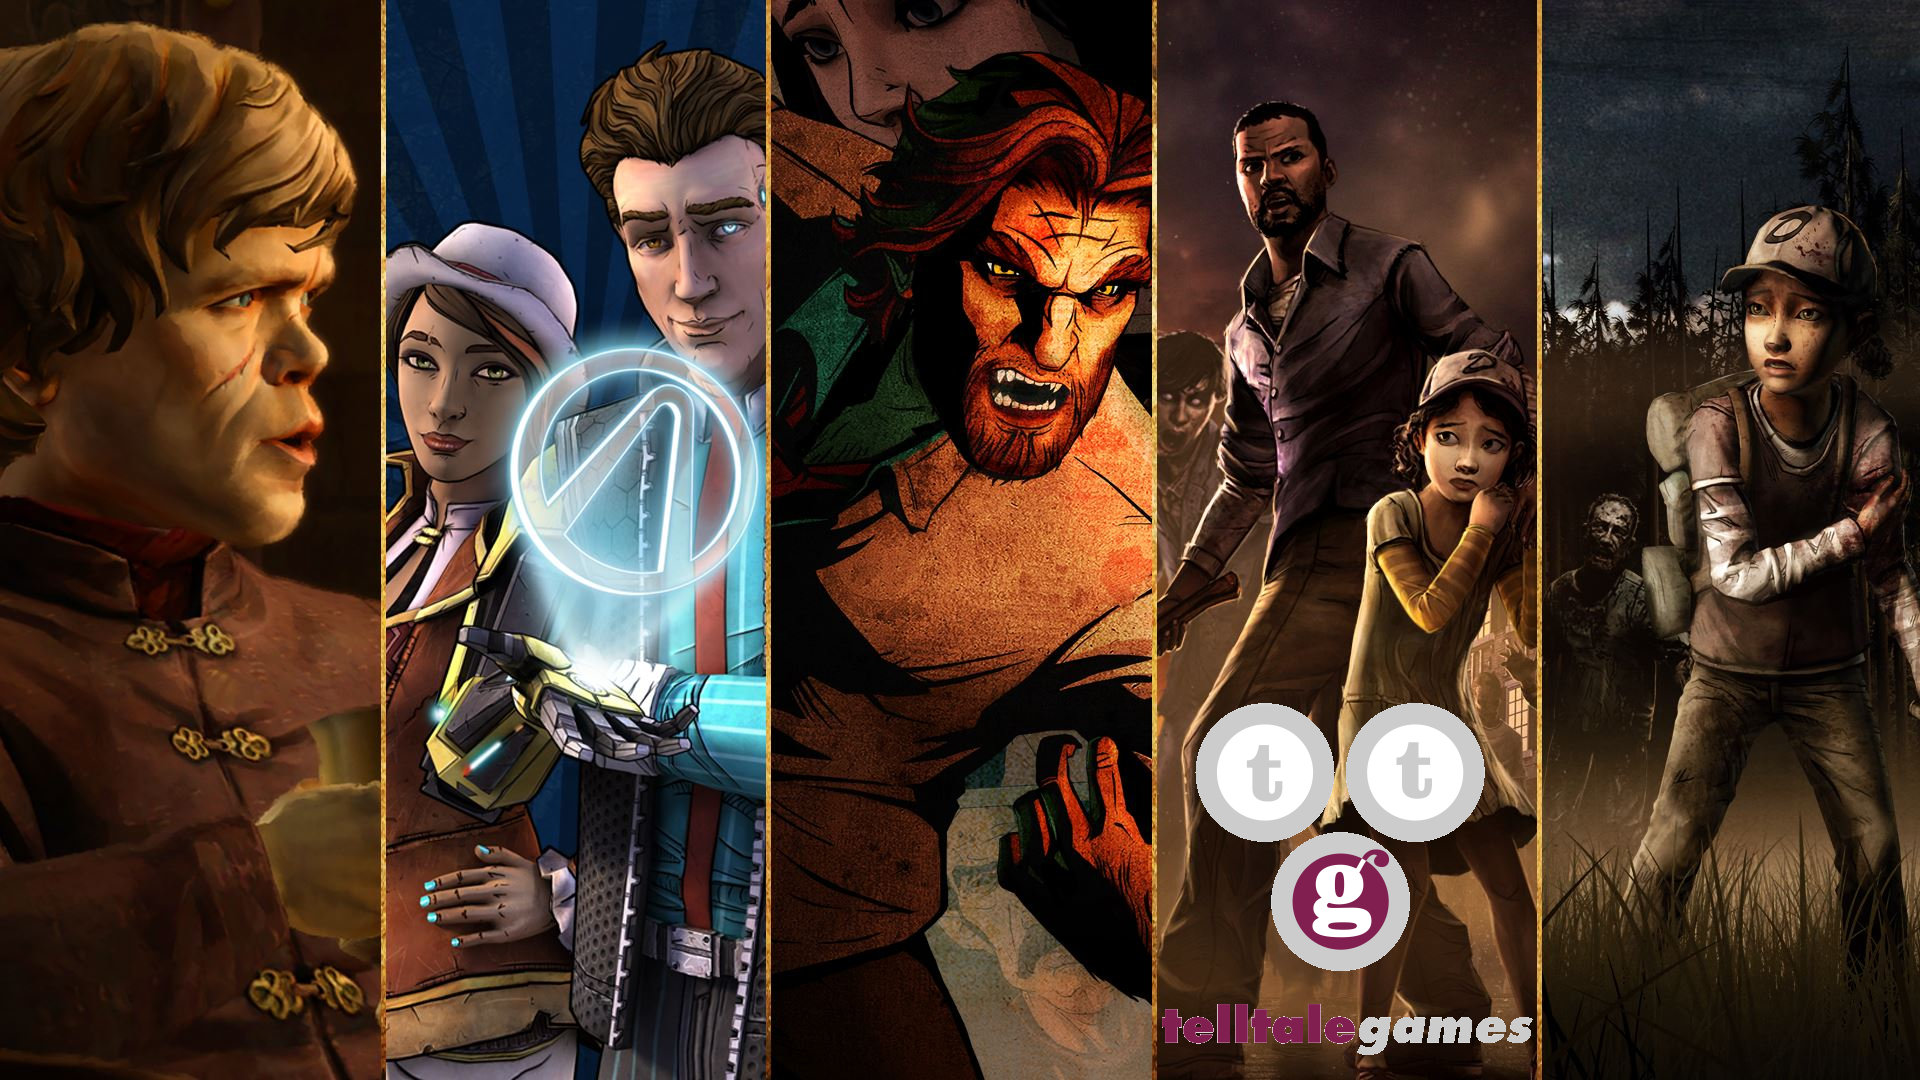 EGLA - TellTale Games